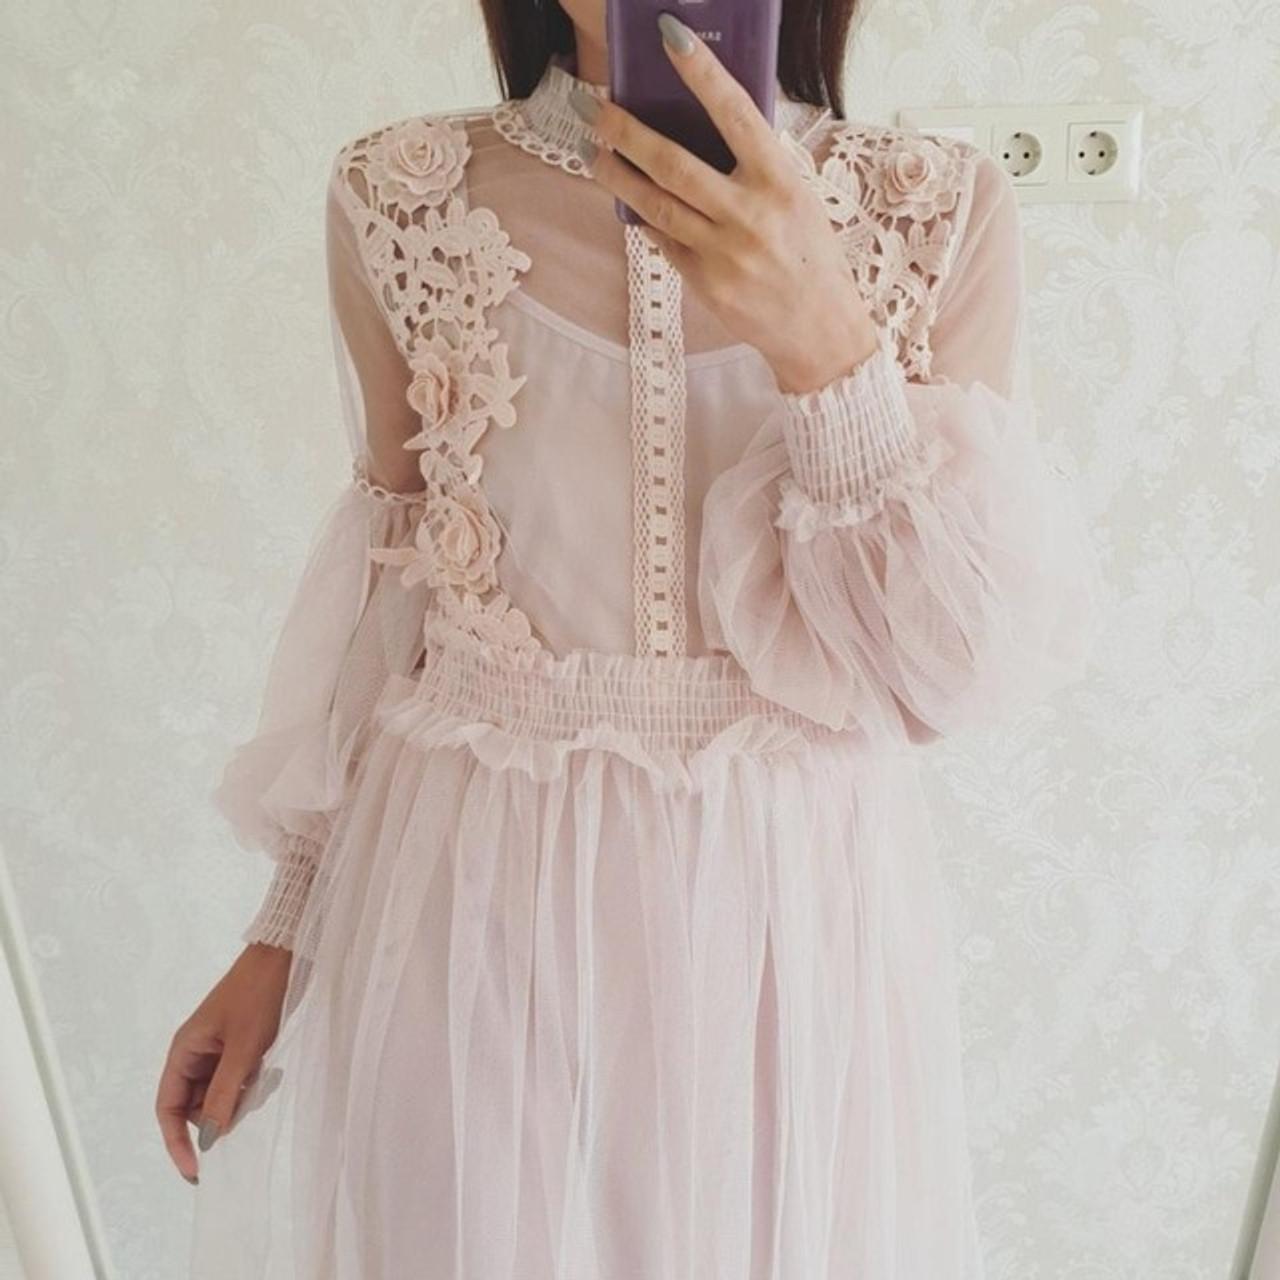 f918125bd6 Stand-Neck Long-Sleeved Party Dresses Women Sweet Mesh Streetwear Mid-Calf  Dress Female 2018 Summer Lace Dress Vestidos